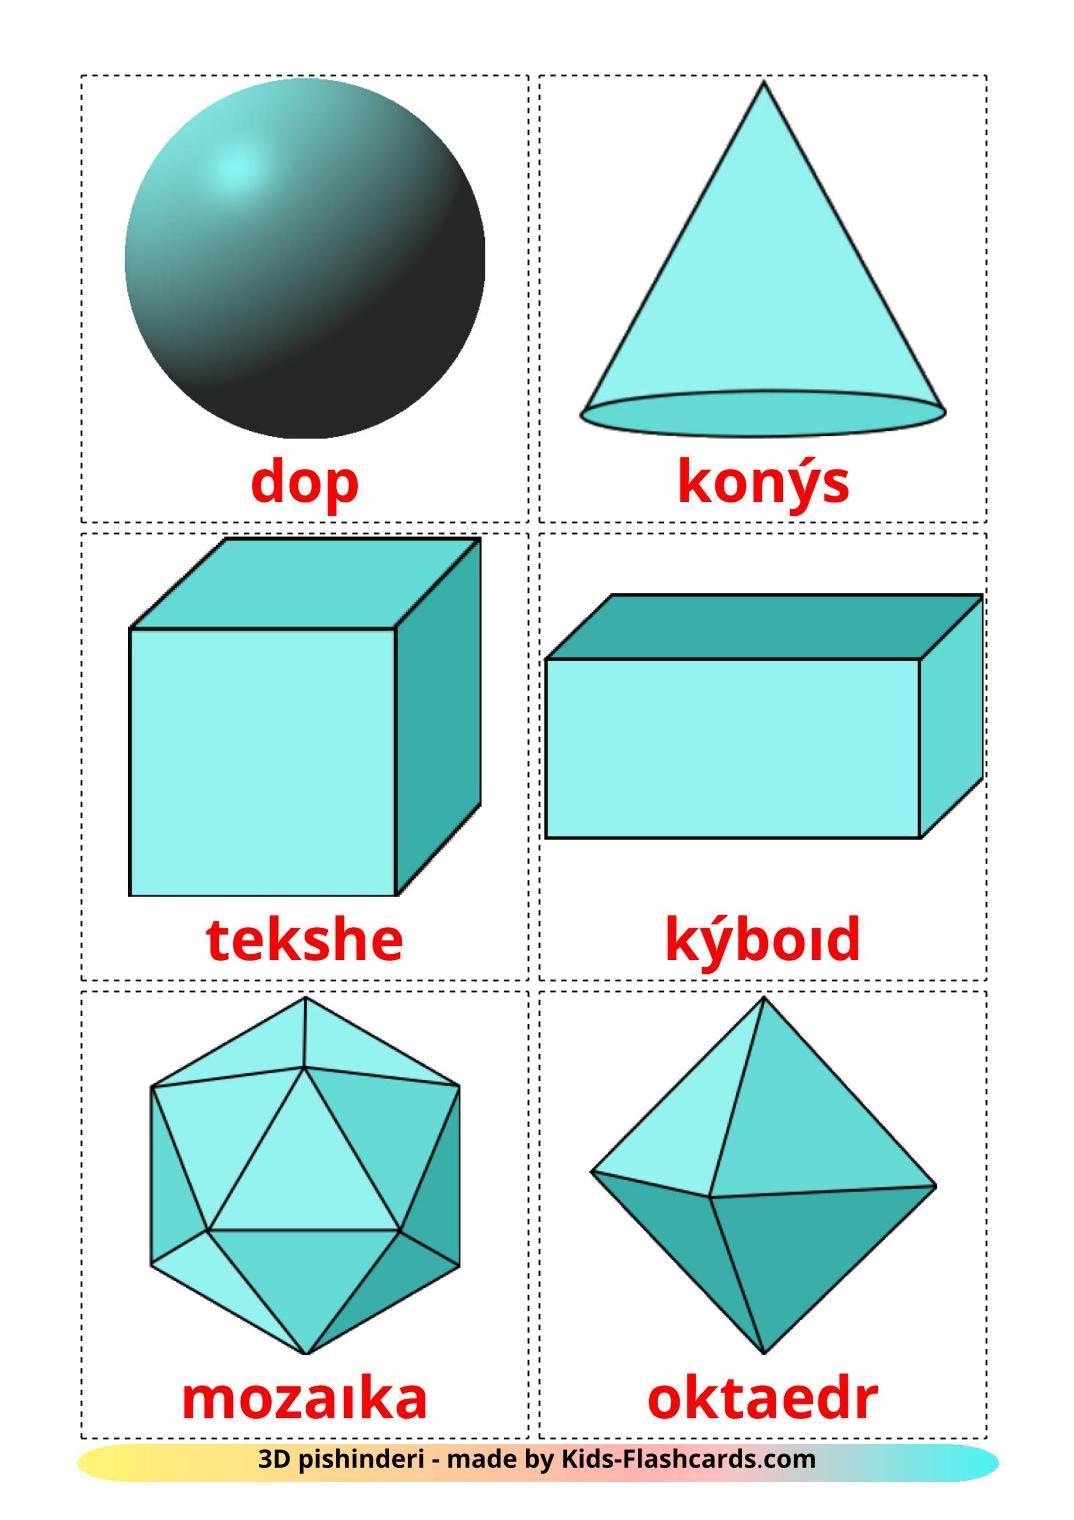 3D Shapes - 17 Free Printable kazakh(latin) Flashcards